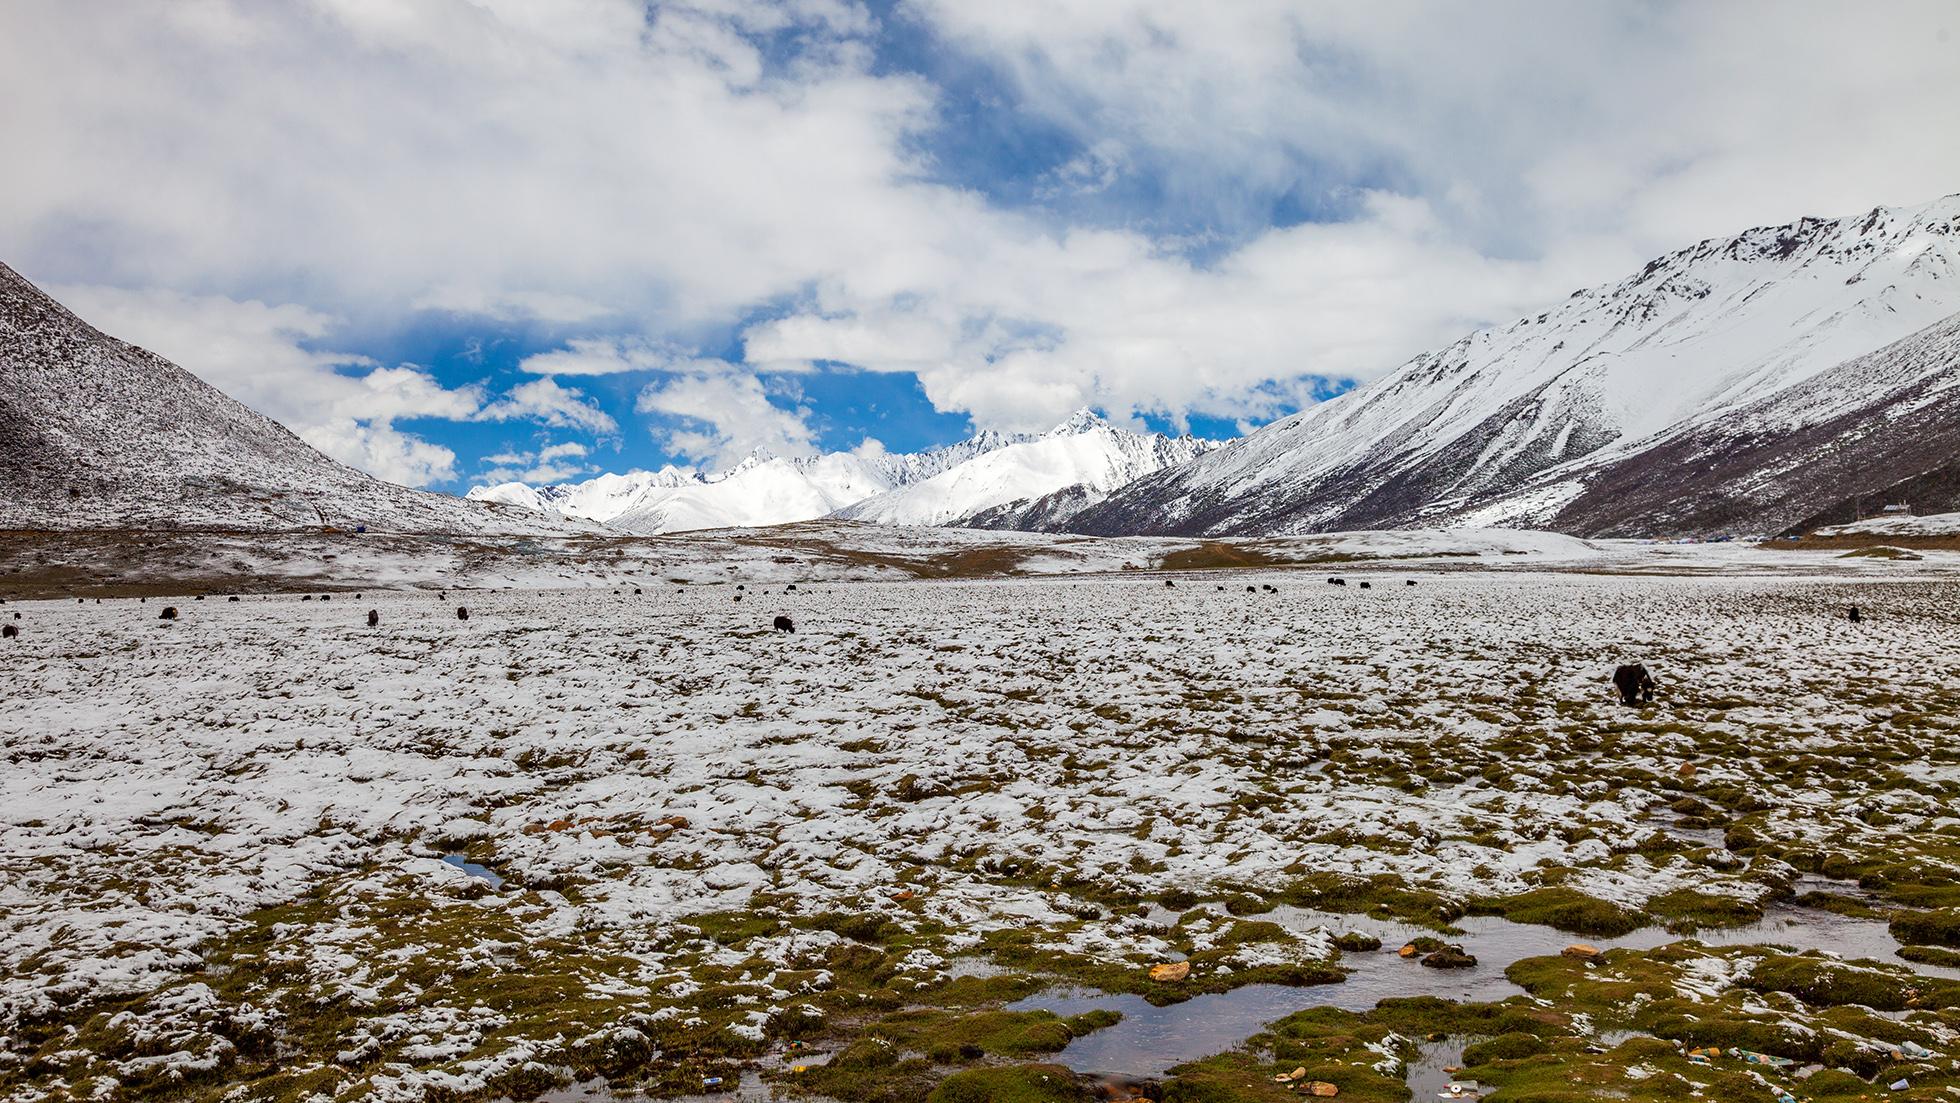 Anjiula Mountain